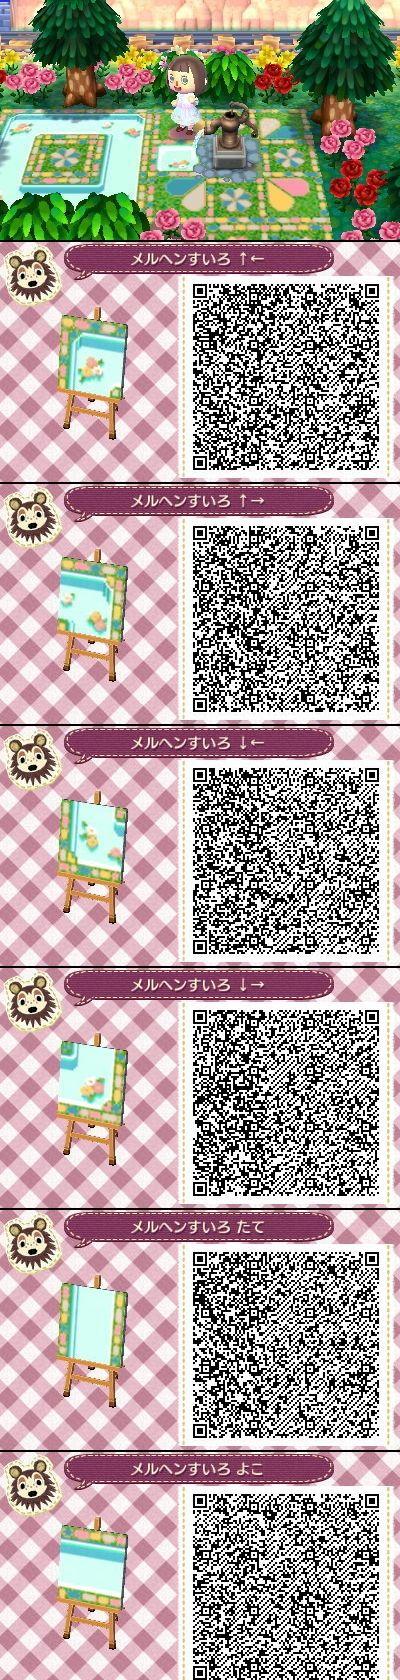 Animal Crossing New Leaf QR codes cute water path